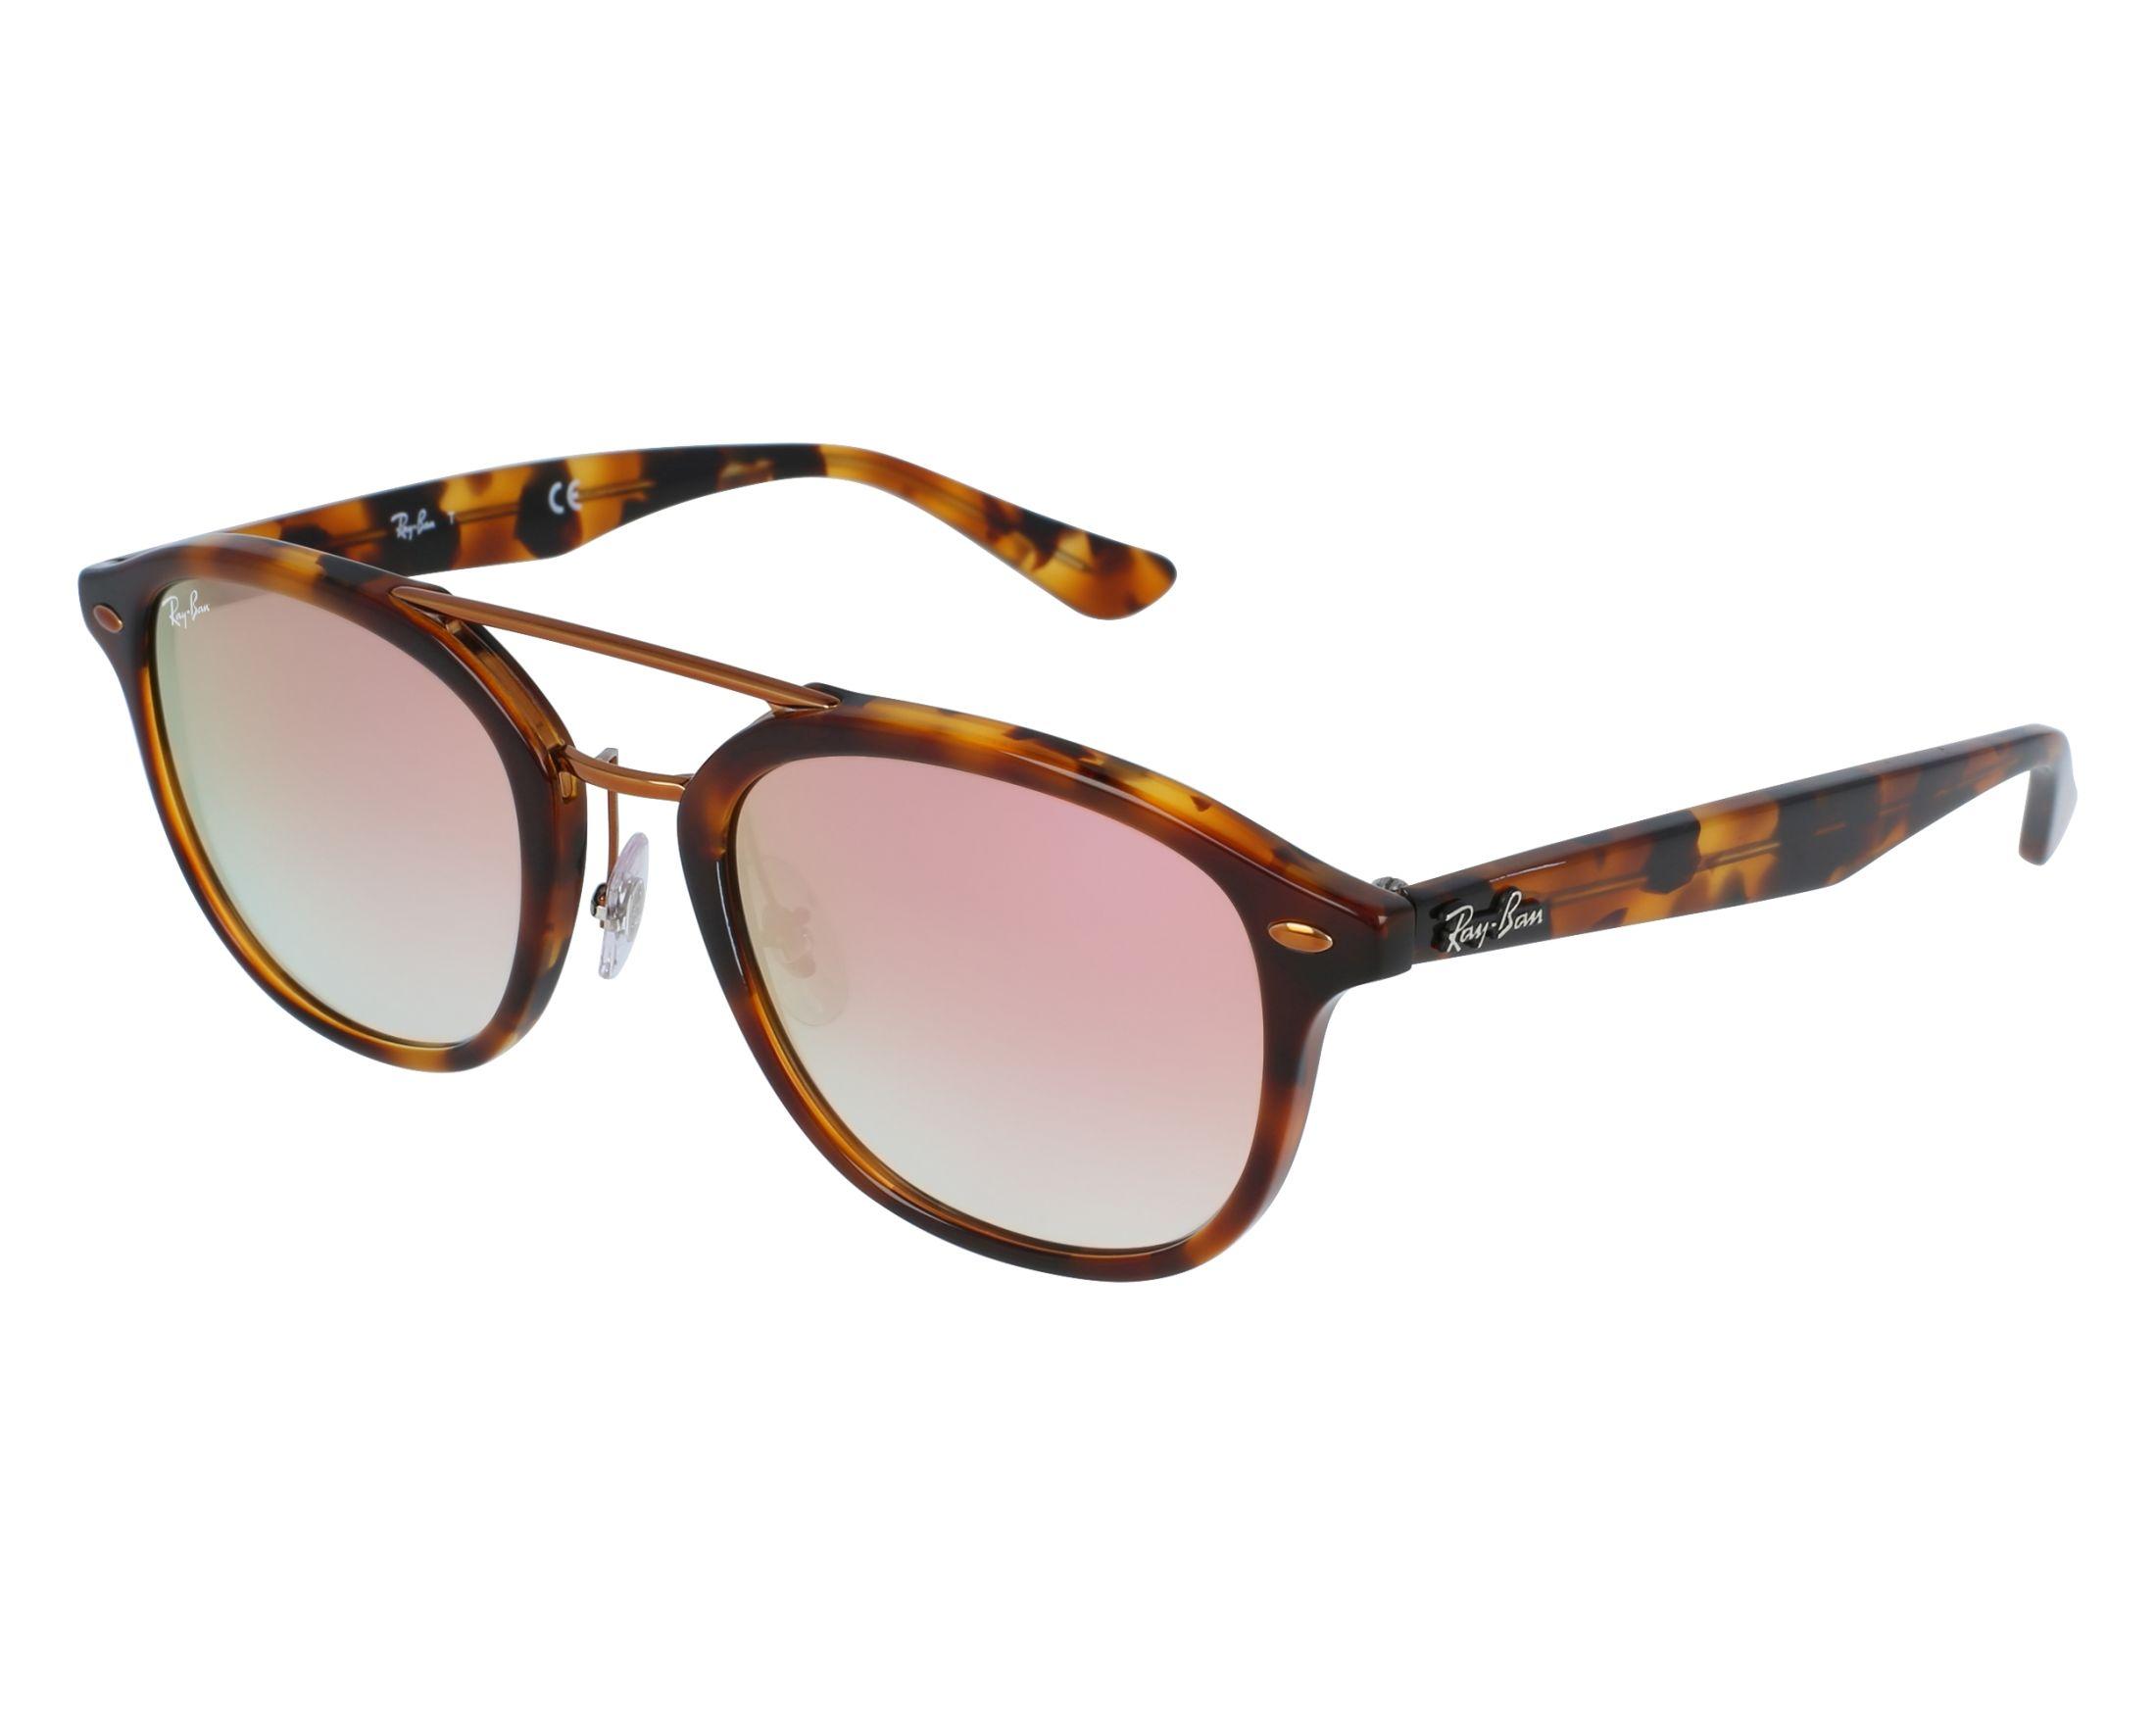 c9813876cb Sunglasses Ray-Ban RB-2183 1127B9 53-21 Havana Copper front view